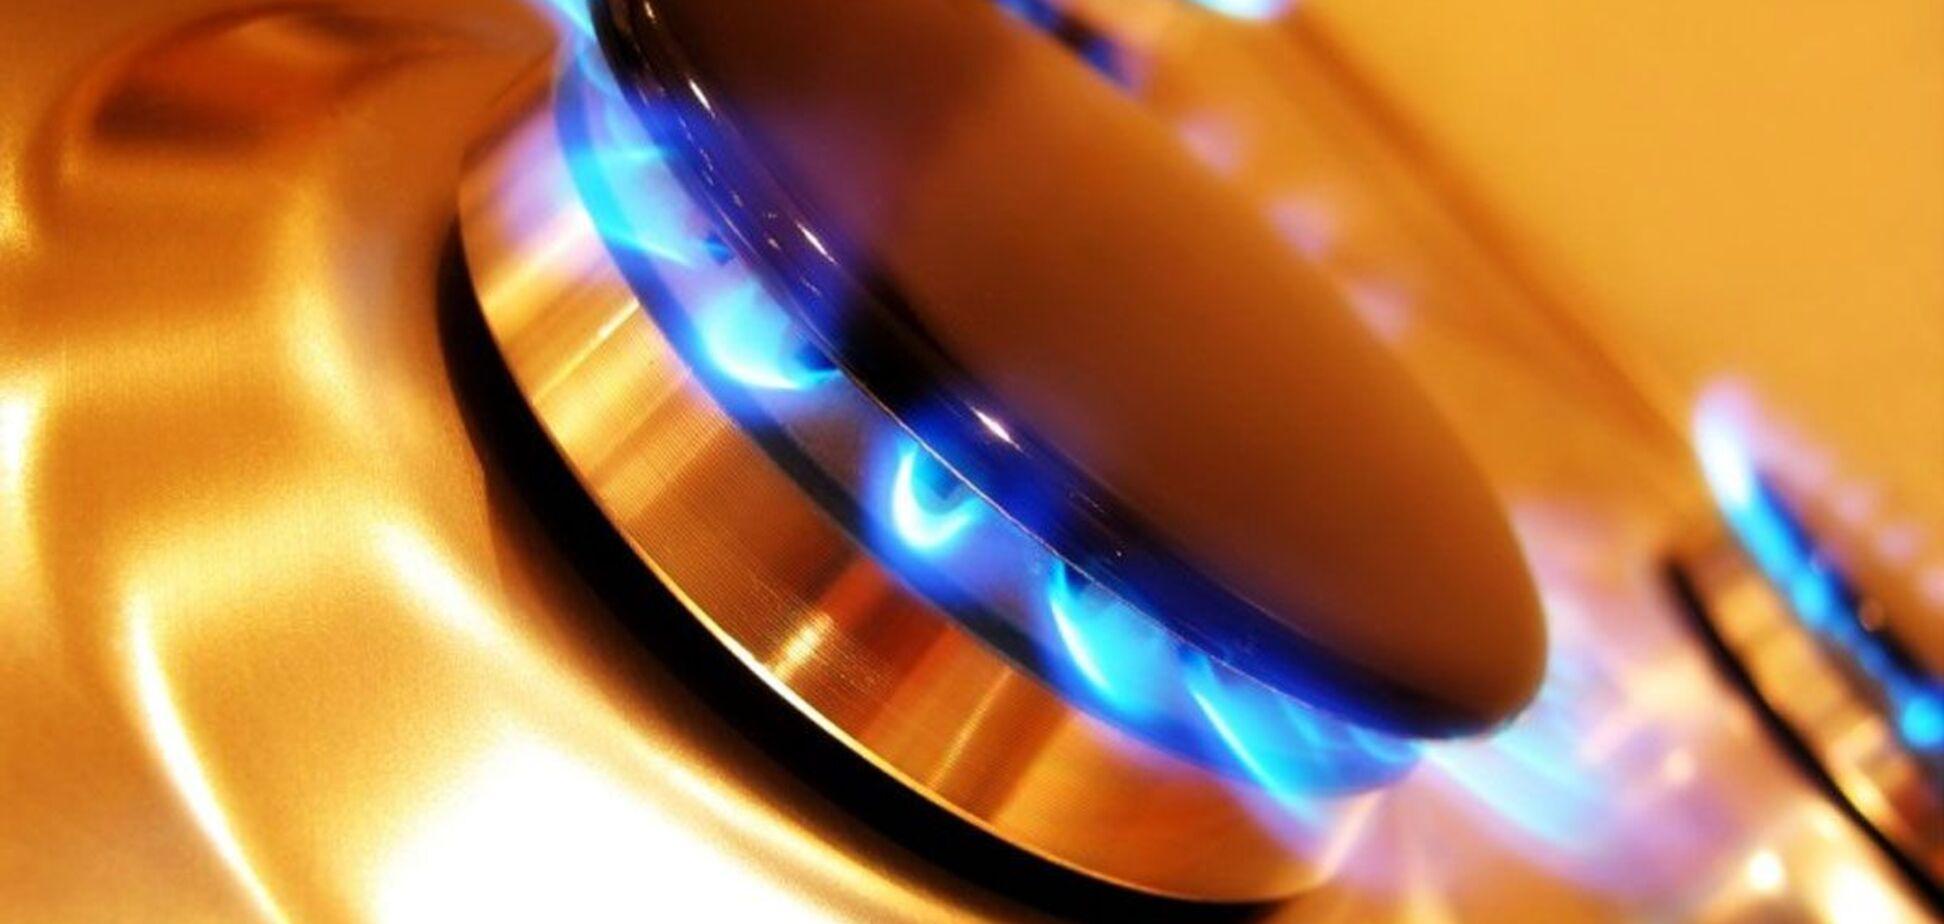 Рынок газа в Украине: динамика цен и рост сервиса